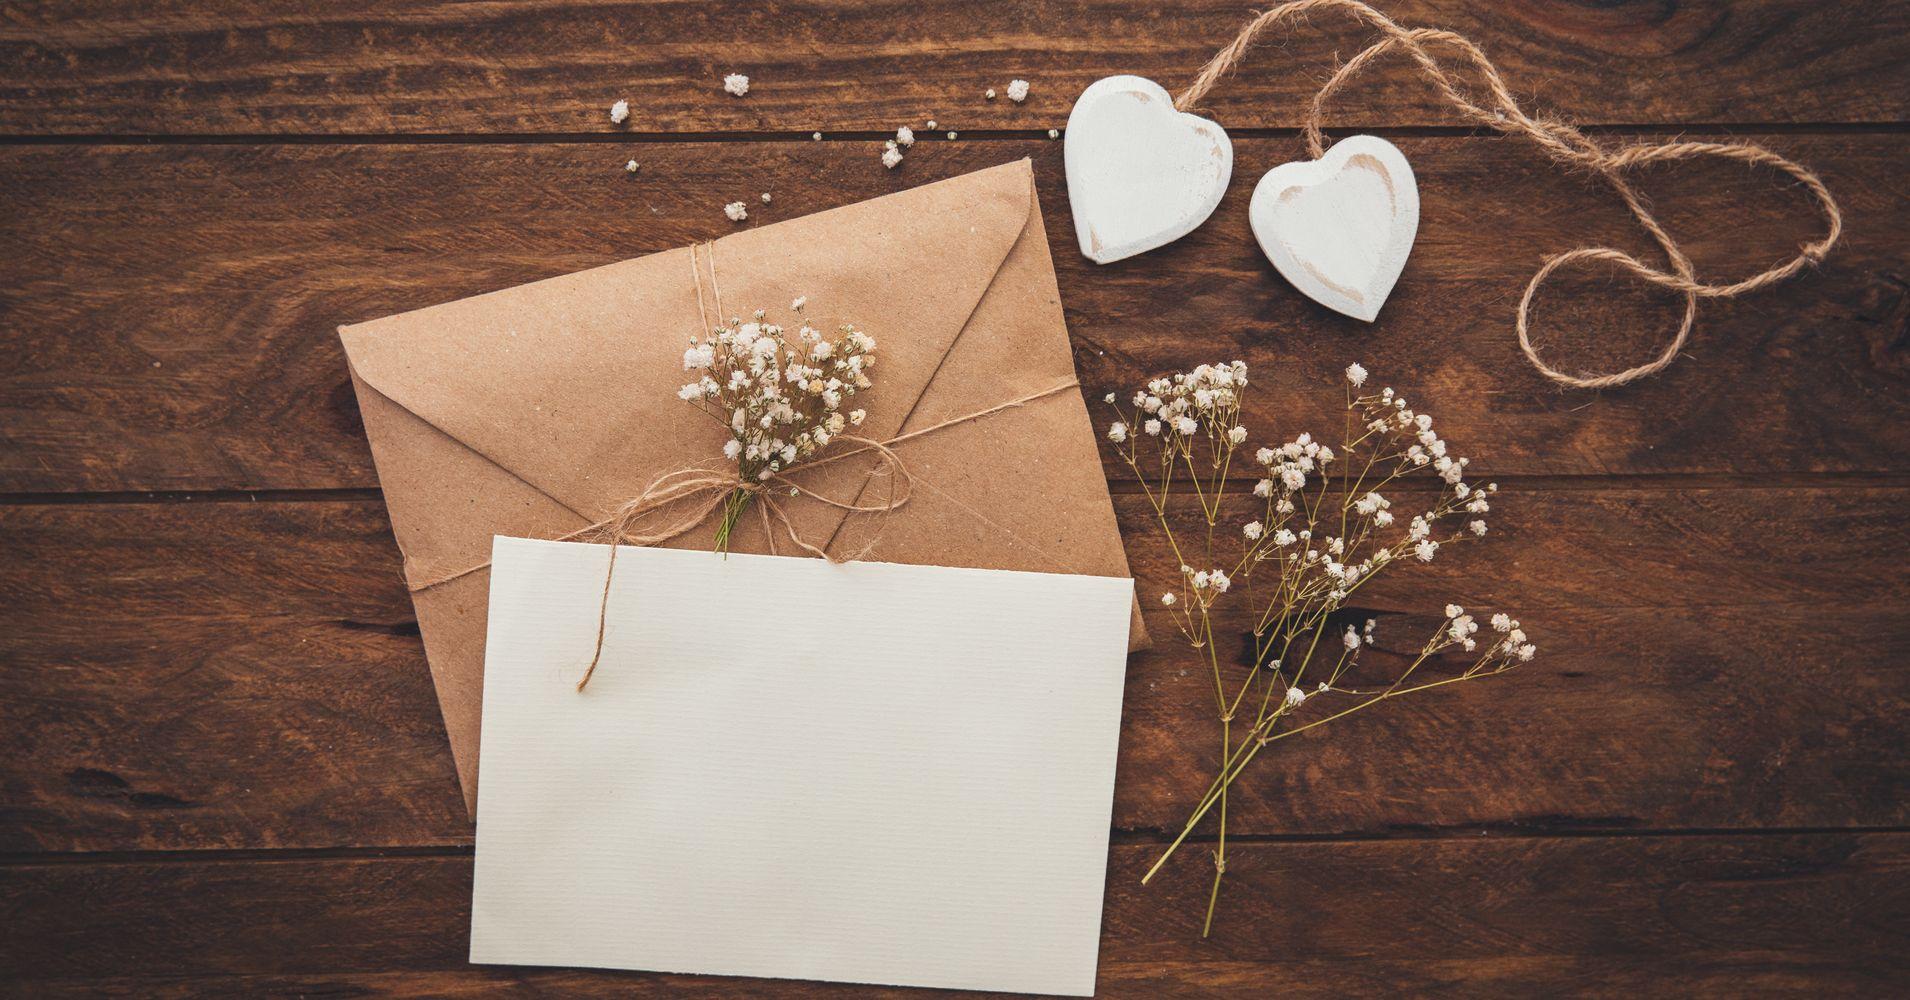 Wedding Invitations Az: Wedding Invitation Business Can't Shun Same-Sex Couples